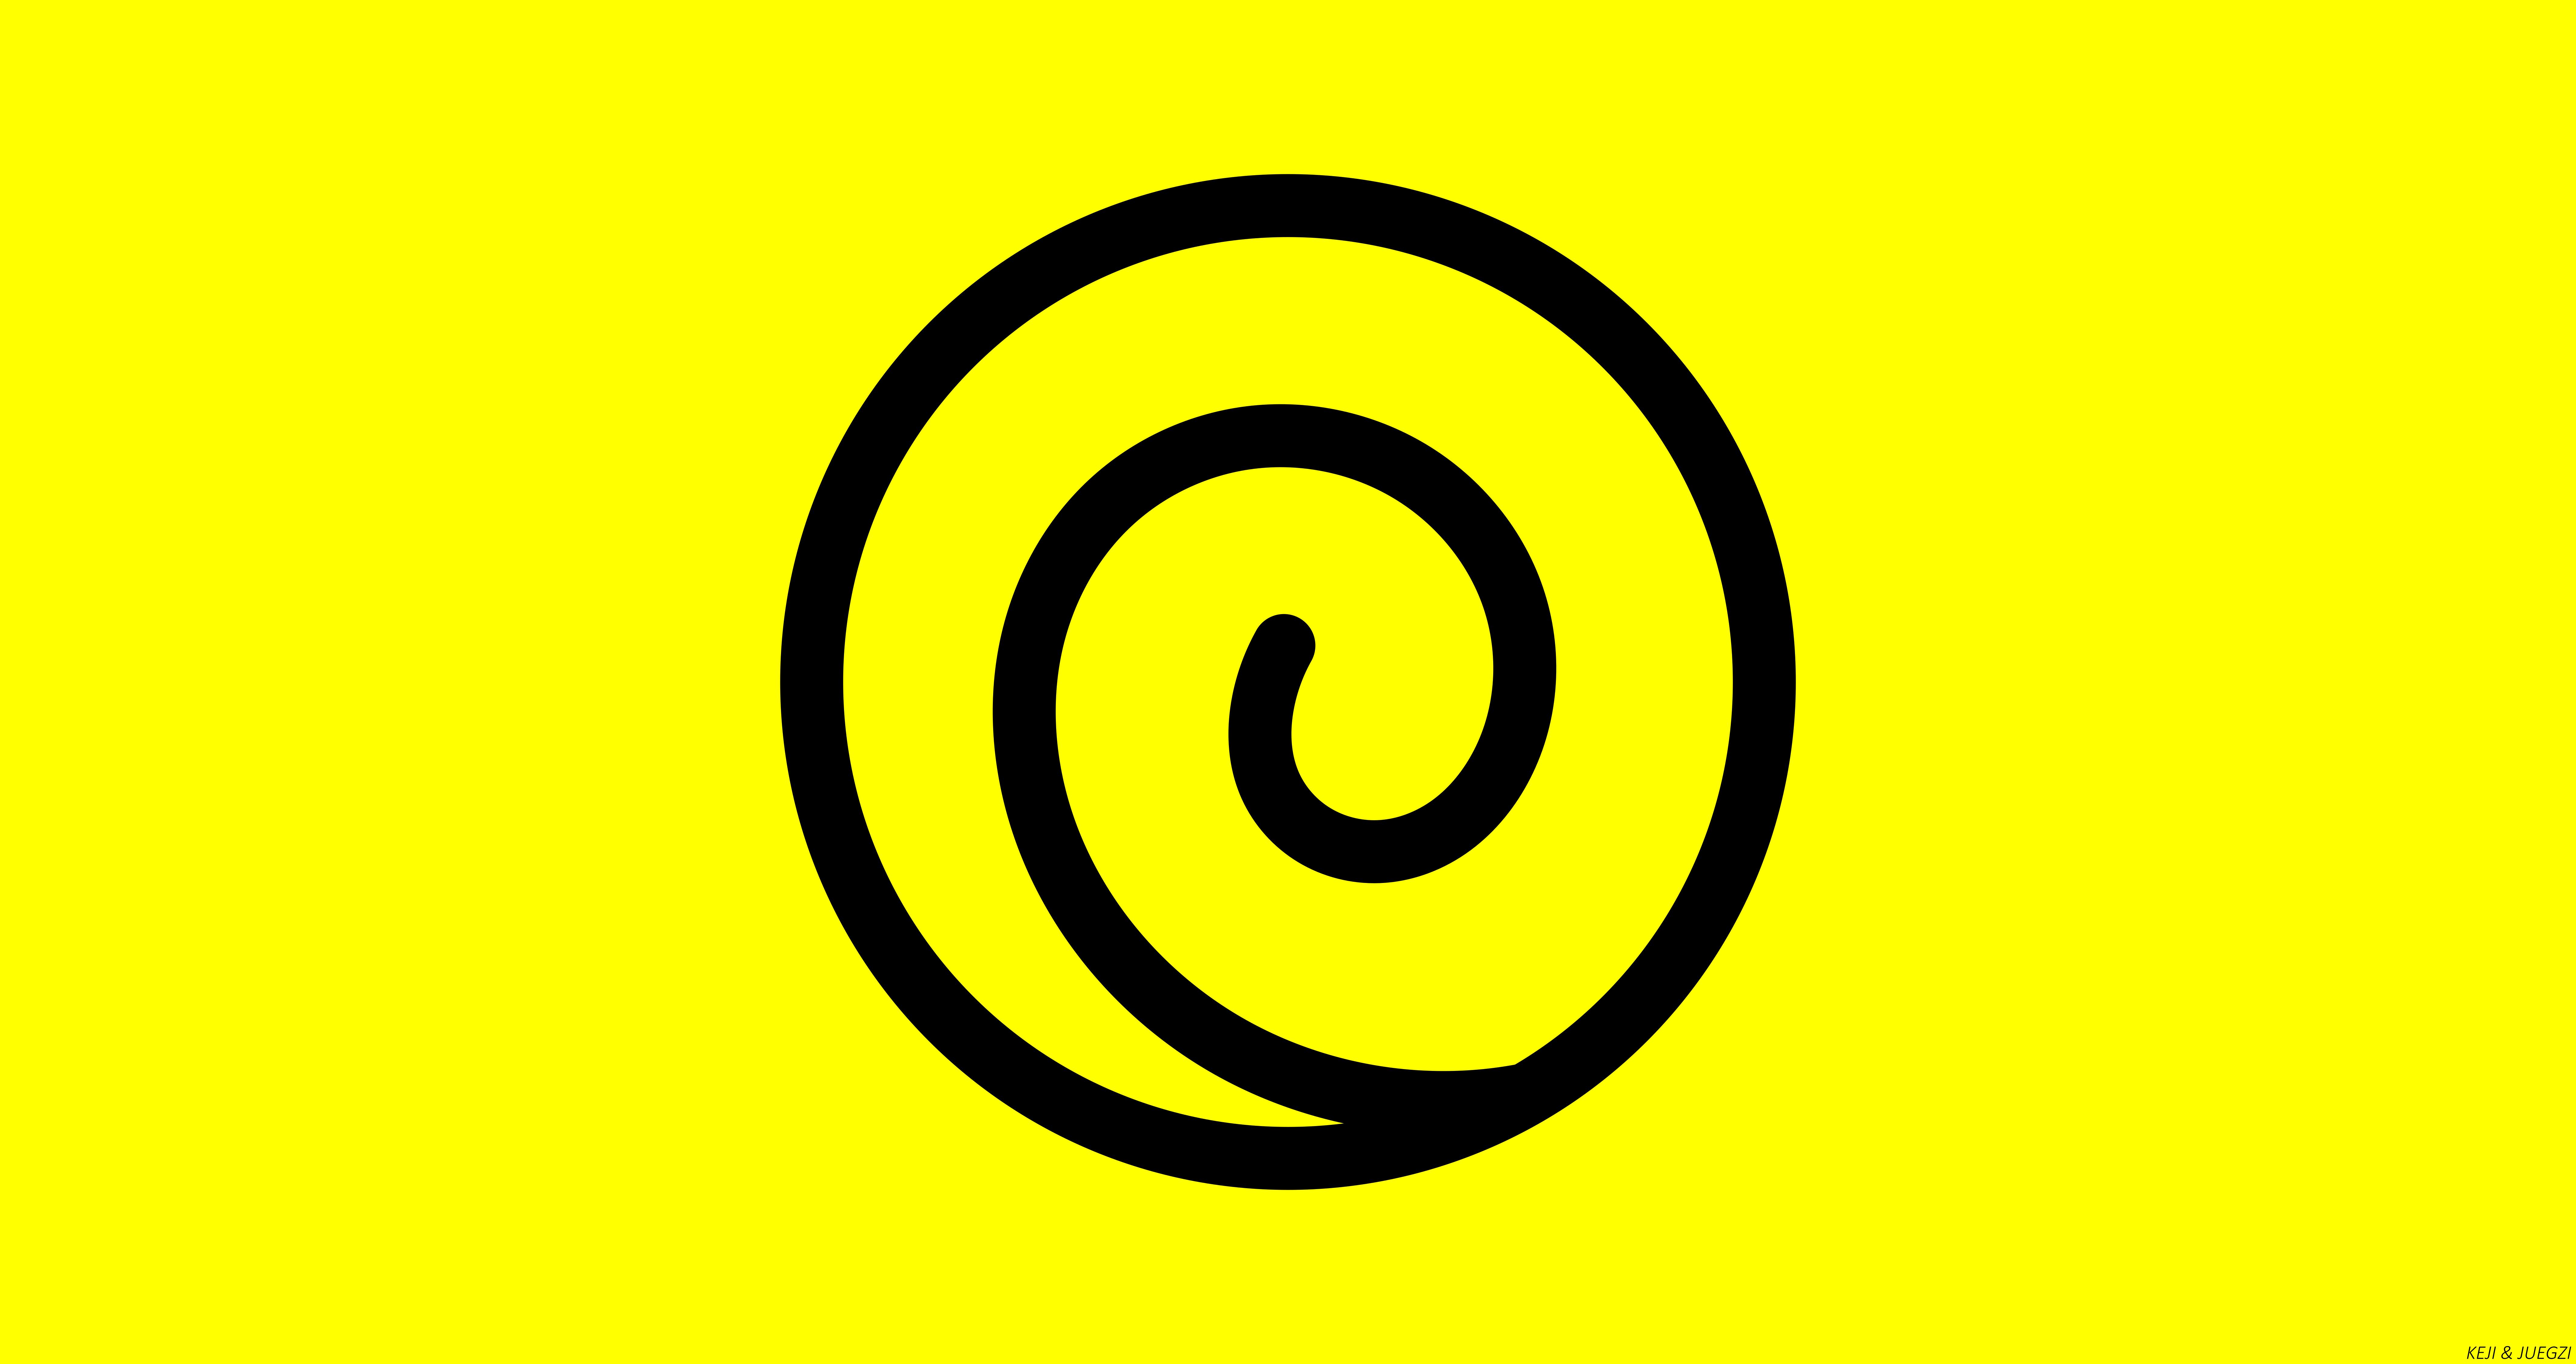 Symbol Circle Naruto Boruto Anime Boruto Naruto Next Generations 8500x4500